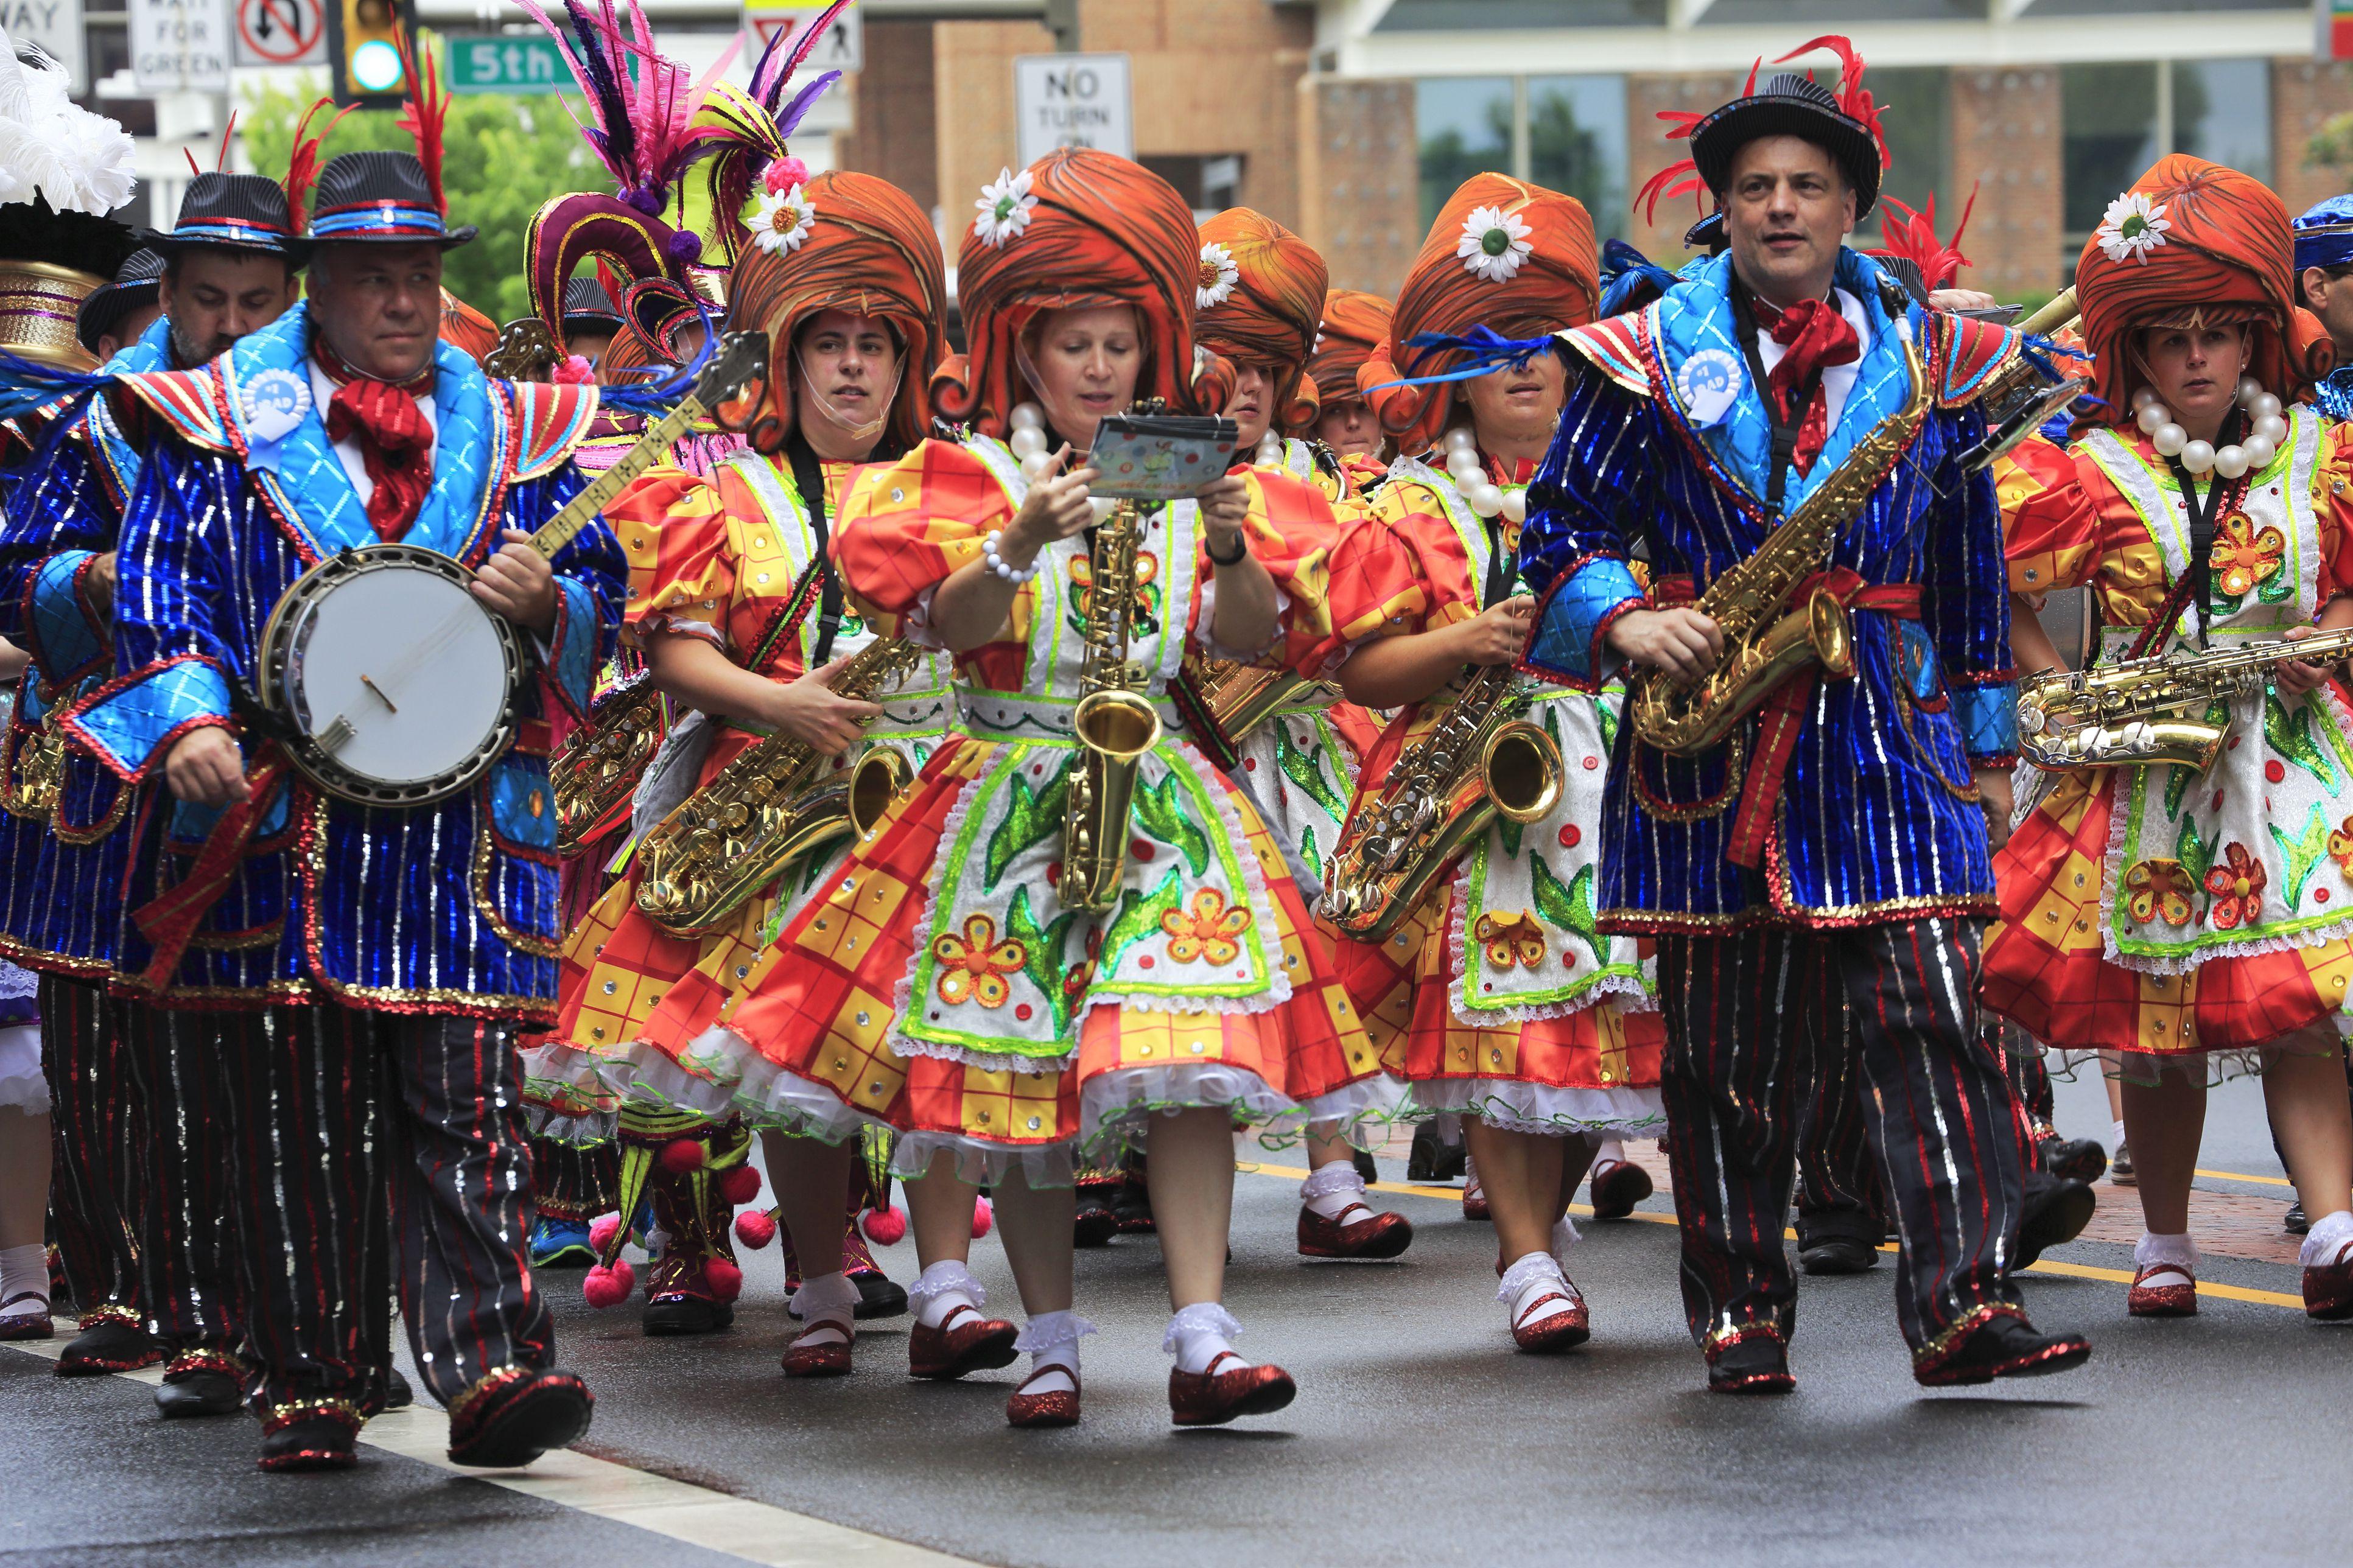 Alsatia Mummers Parade 2017 In Hagerstown Maryland